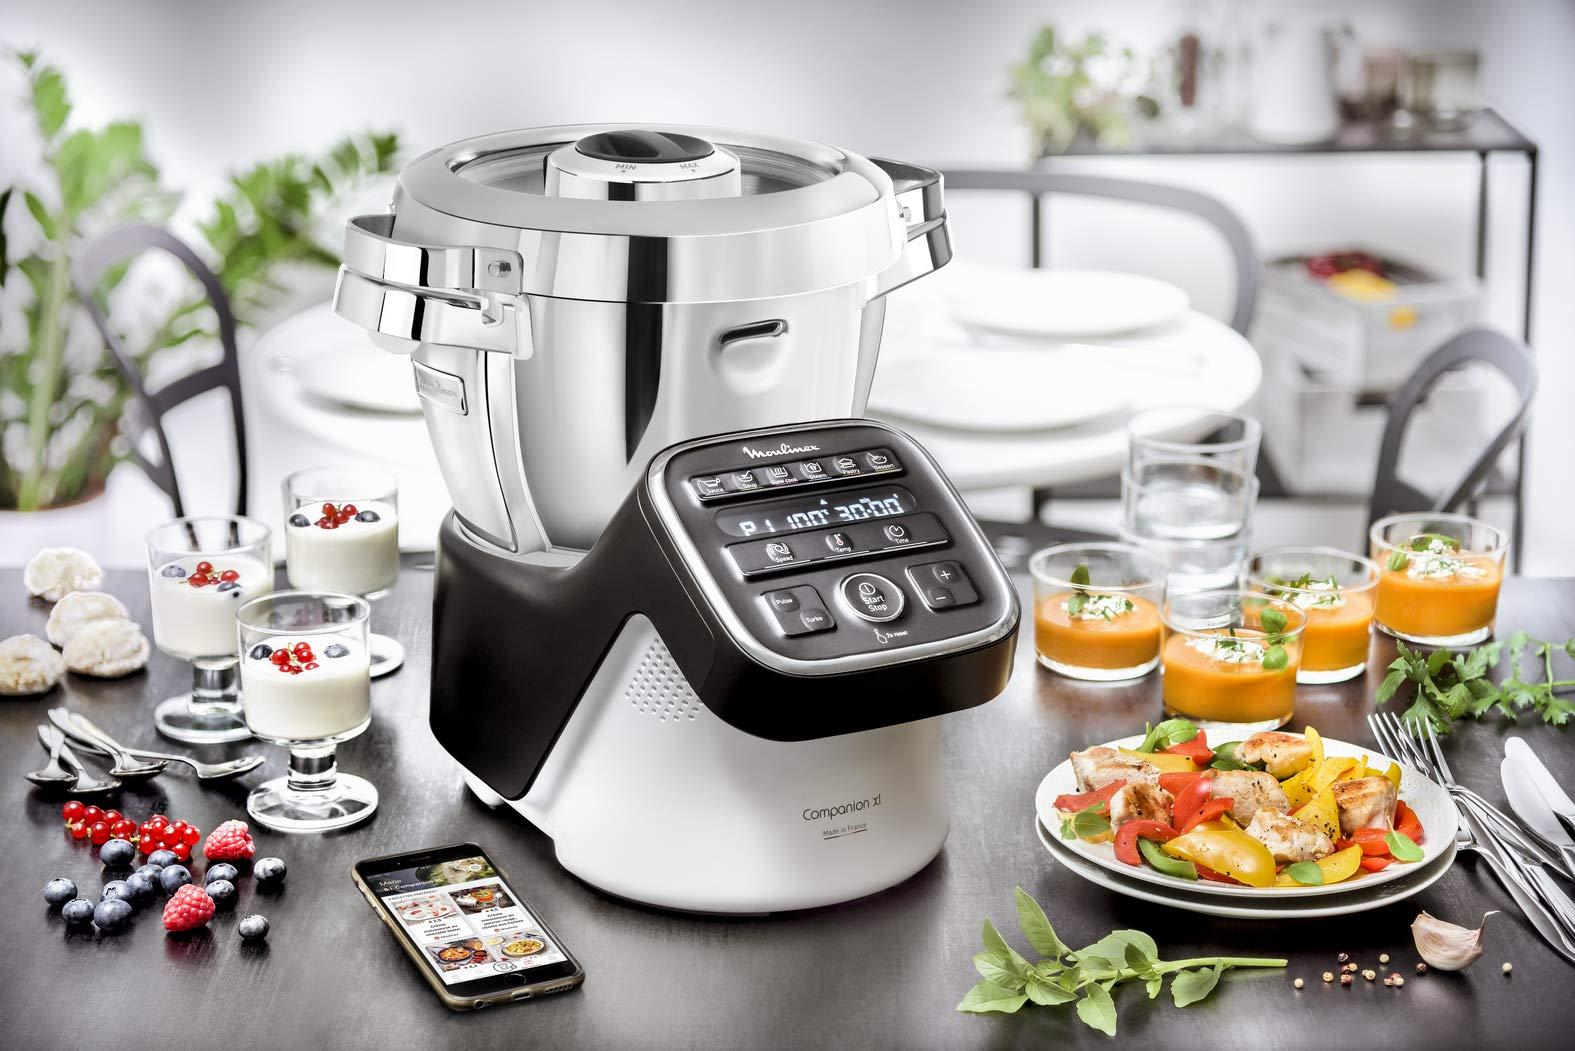 Moulinex Companion XL - Robot de cocina Companion XL, negro gris: Amazon.es: Hogar